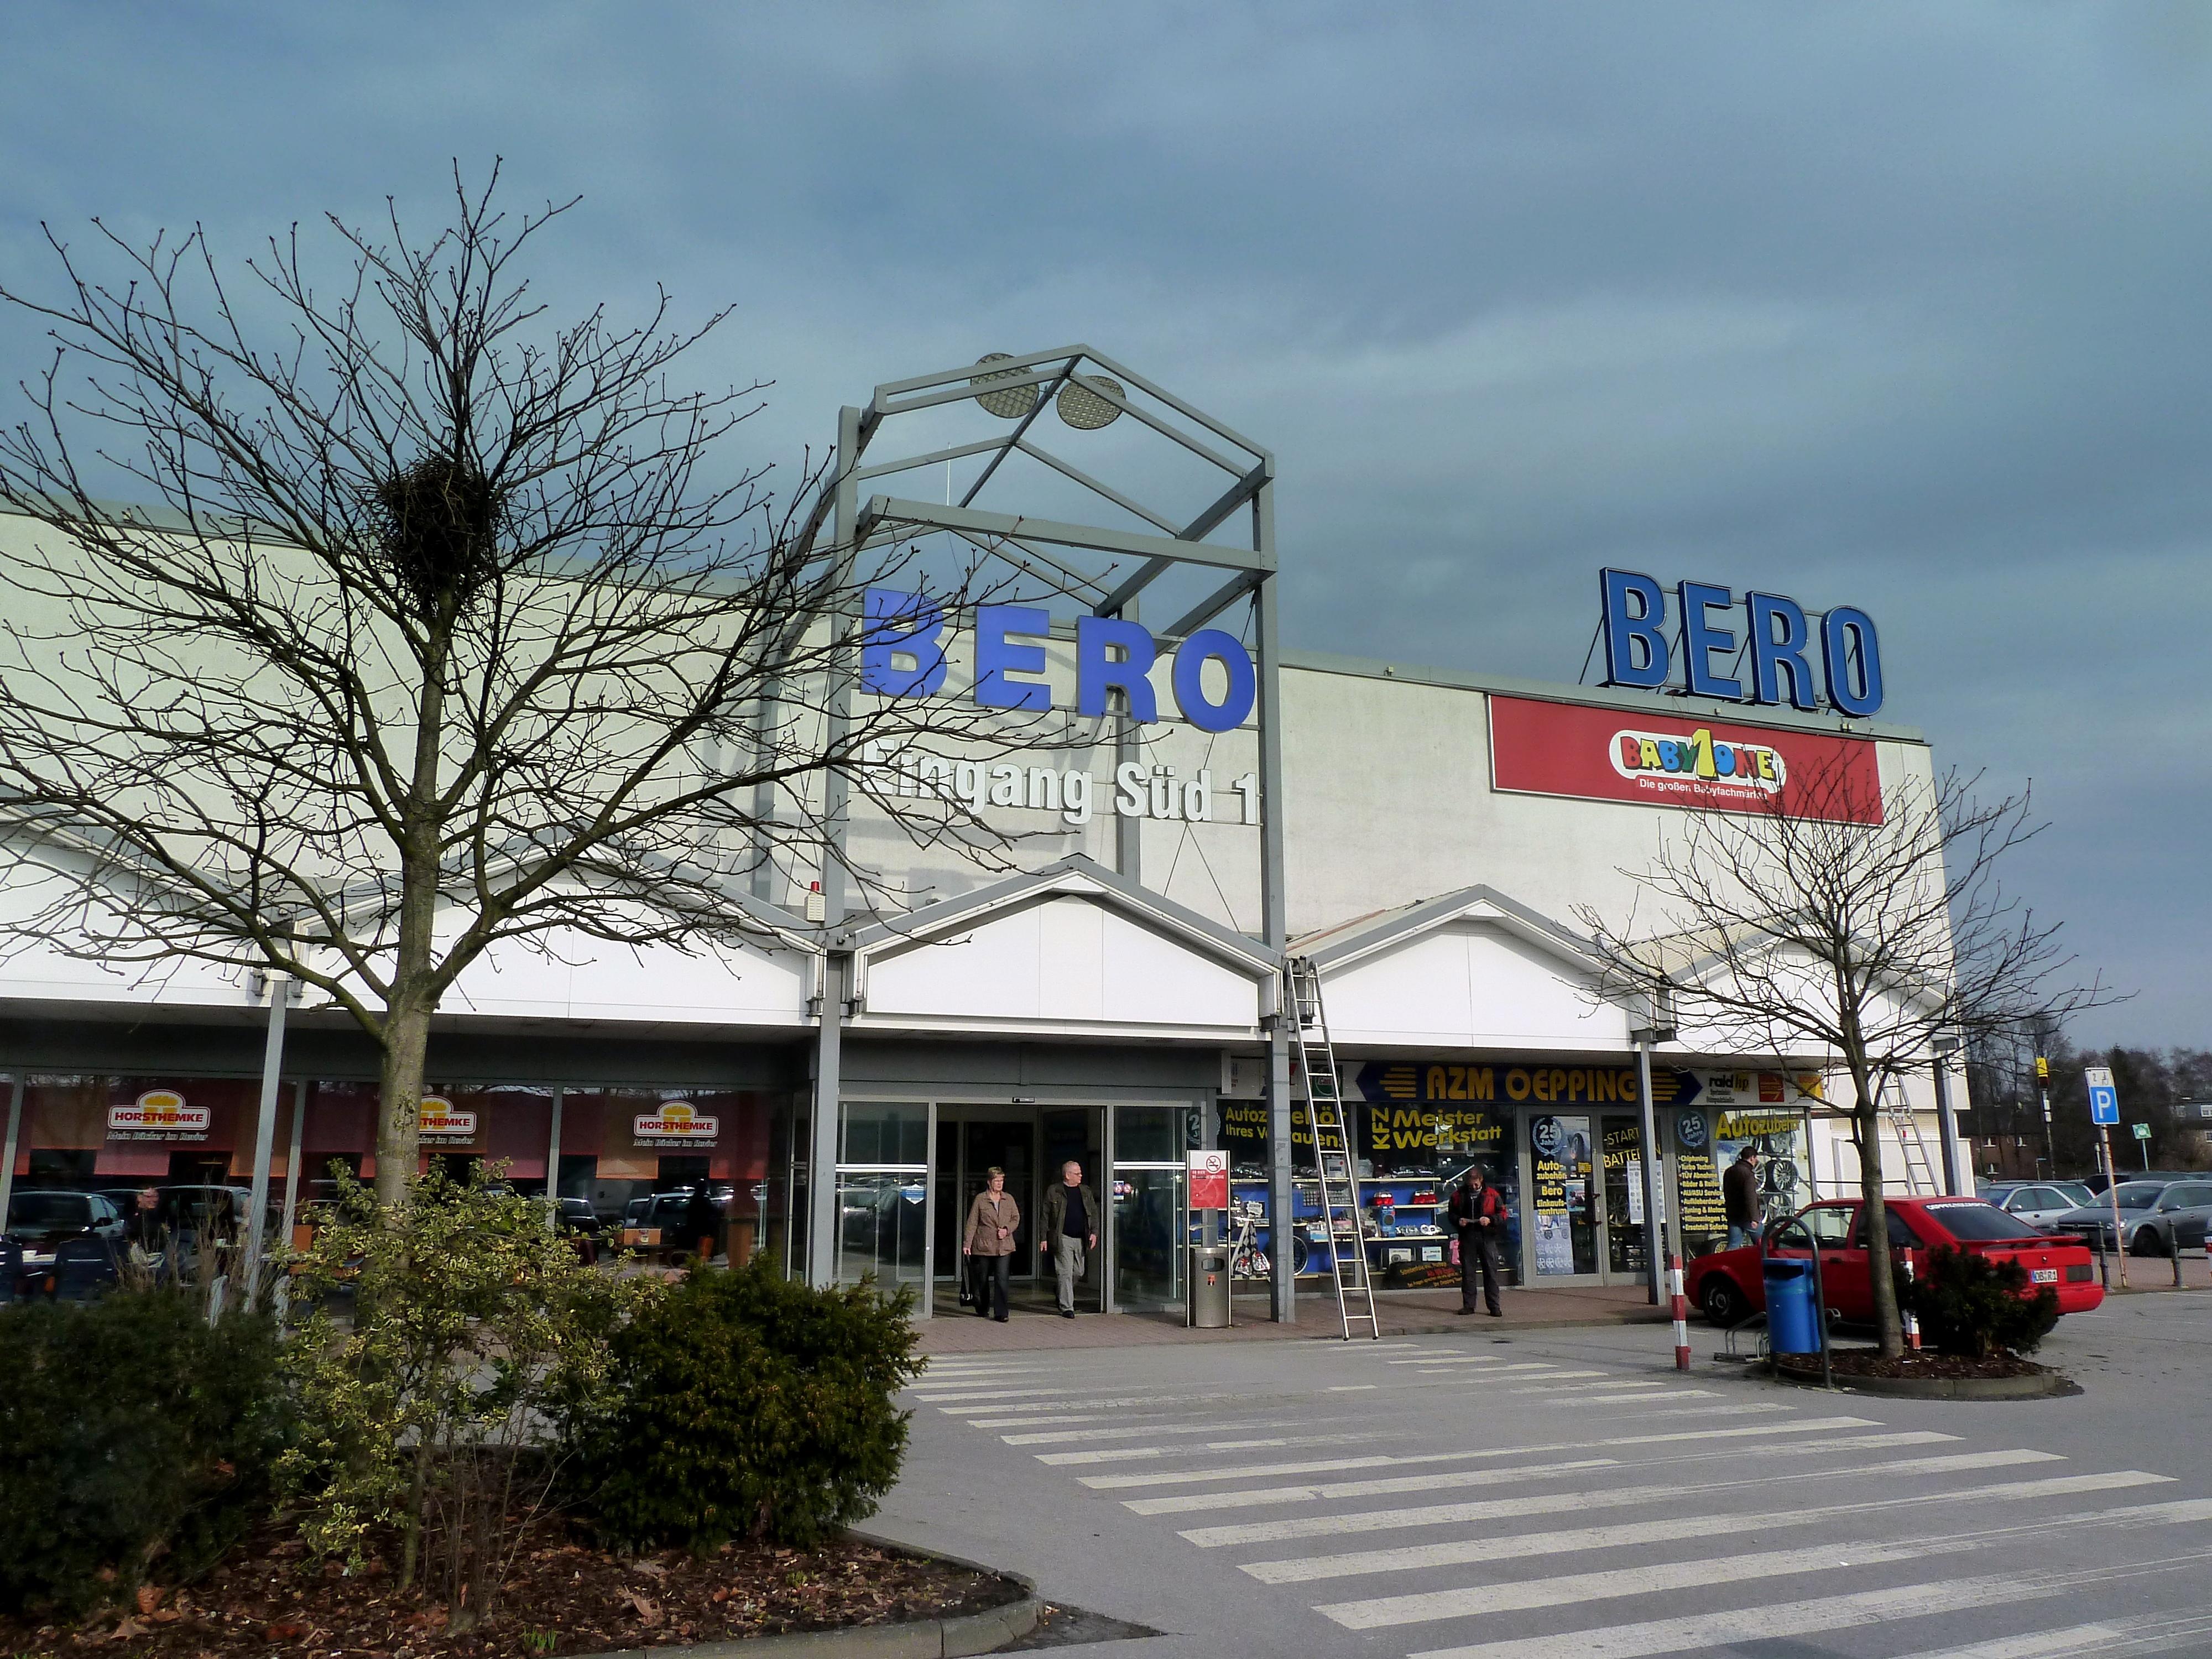 Bero Center Oberhausen öffnungszeiten : file bero zentrum oberhausen eingang s d 1 ~ Watch28wear.com Haus und Dekorationen